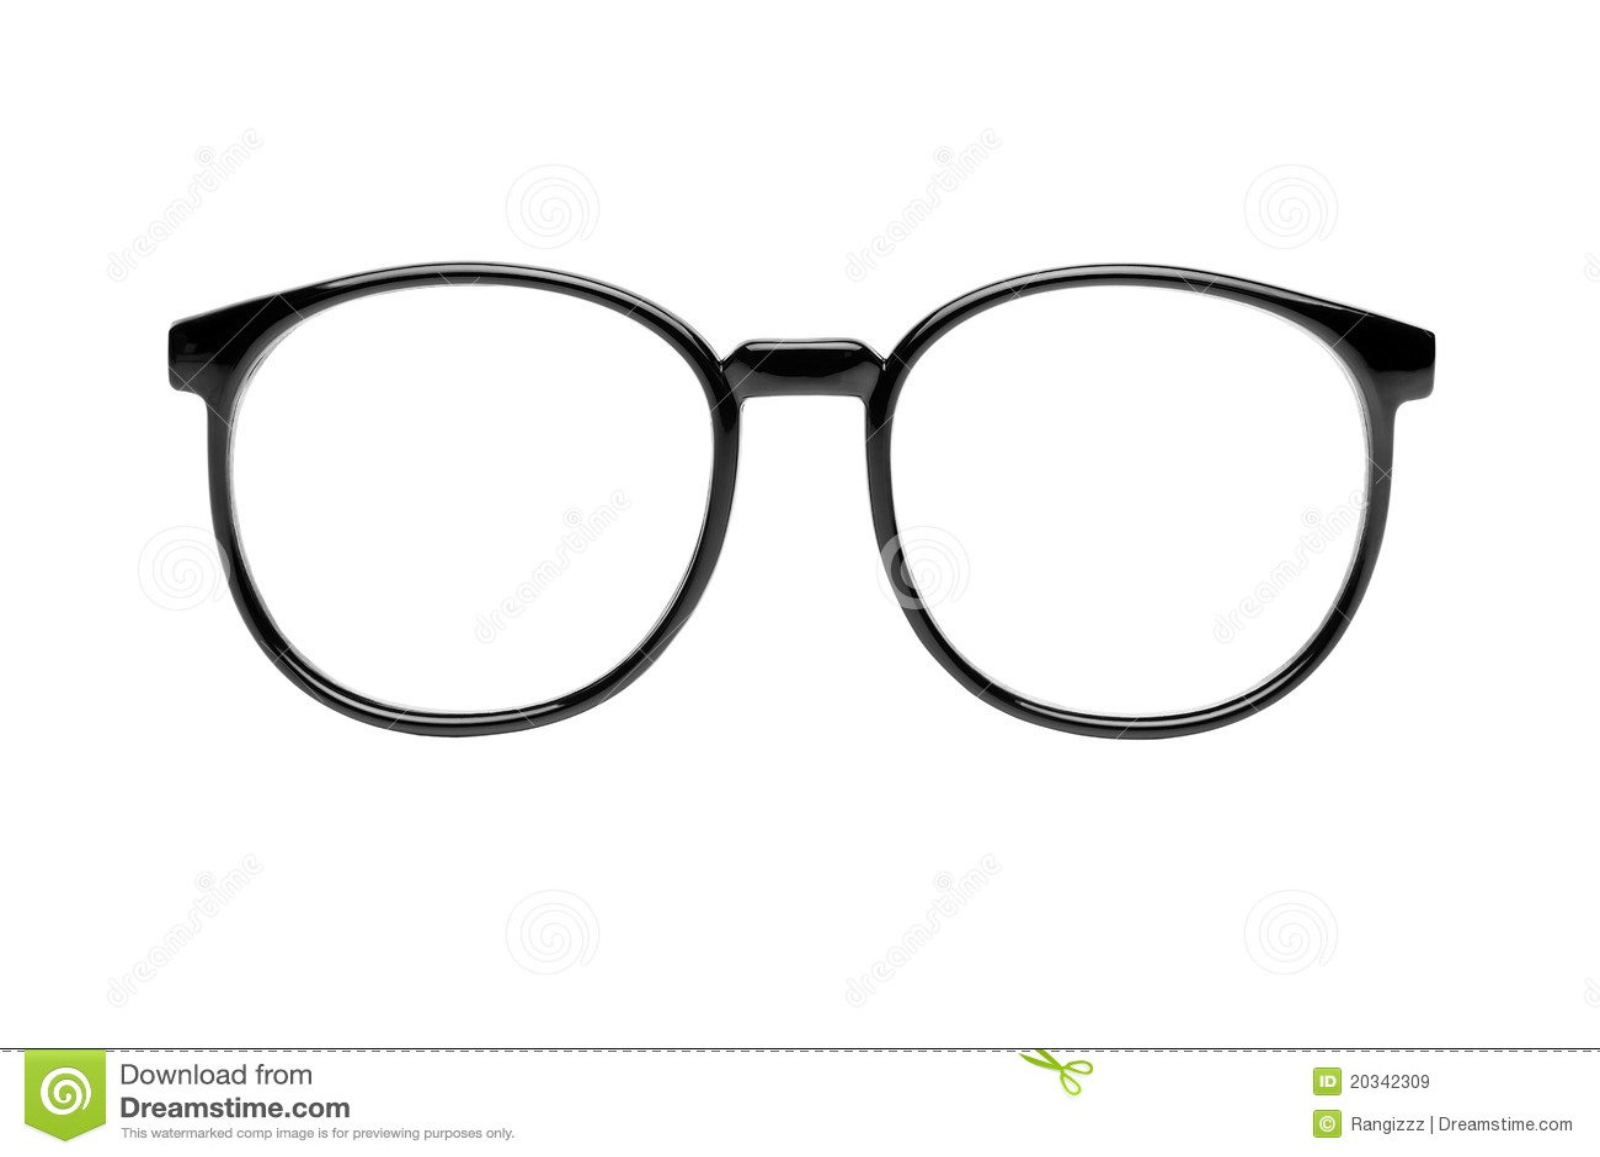 clipart girl glasses - photo #31